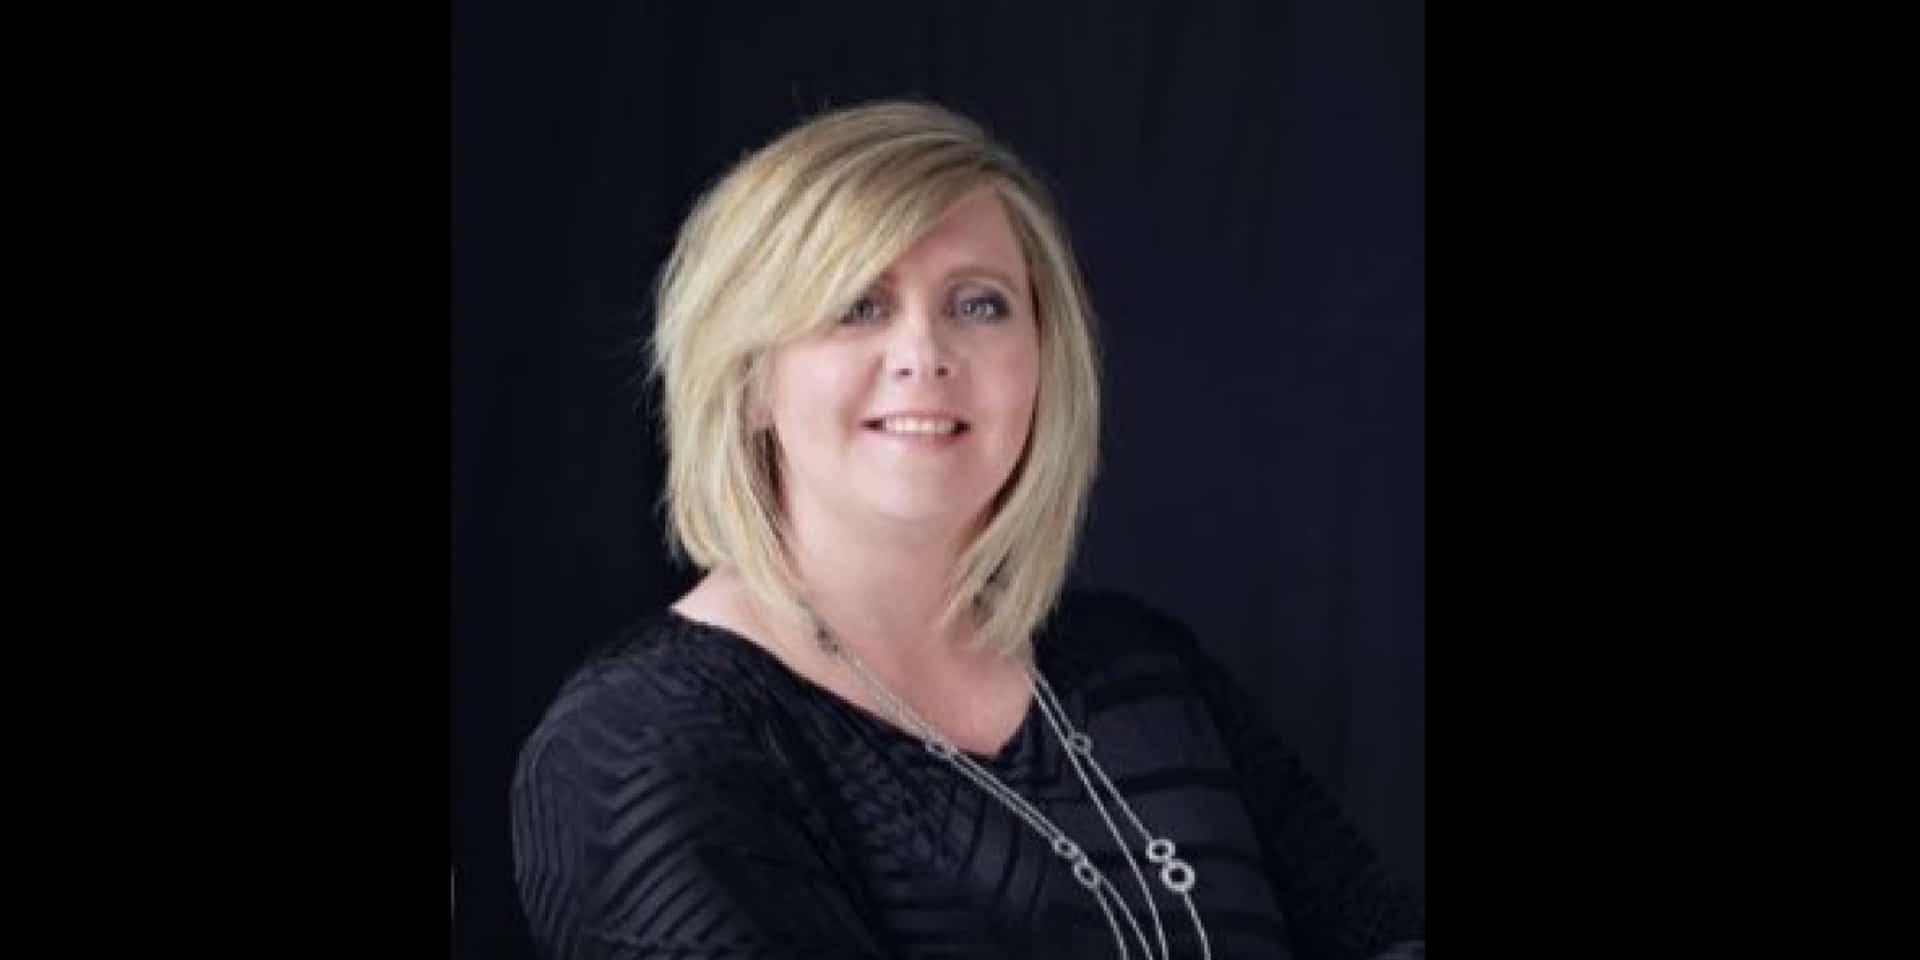 Michelle Daly Hayes | Media Training Testimonials | Flasheforward